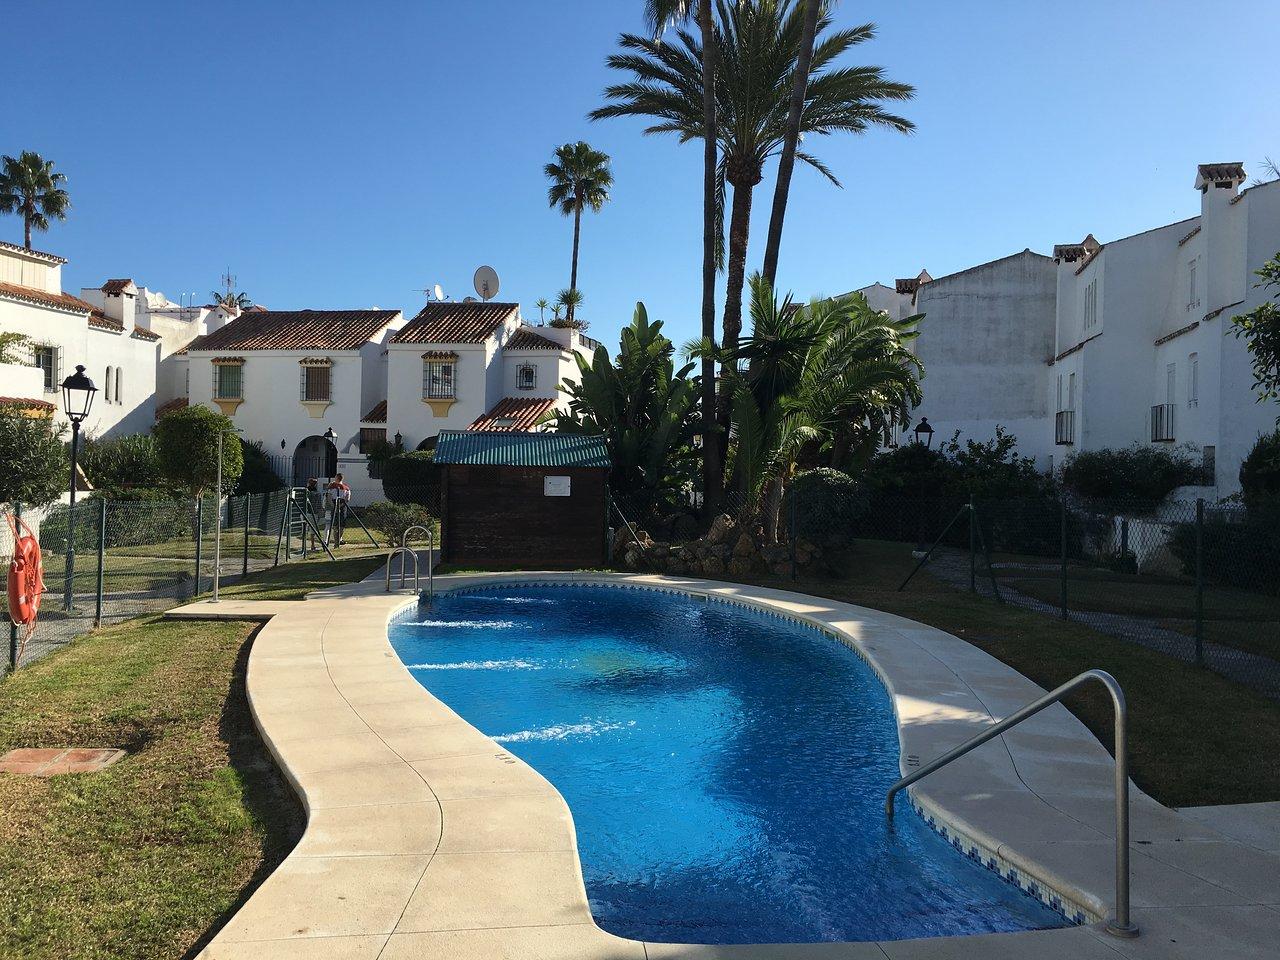 9 ROOMS HOTEL - Prices & Reviews (Malaga, Spain - Costa del Sol